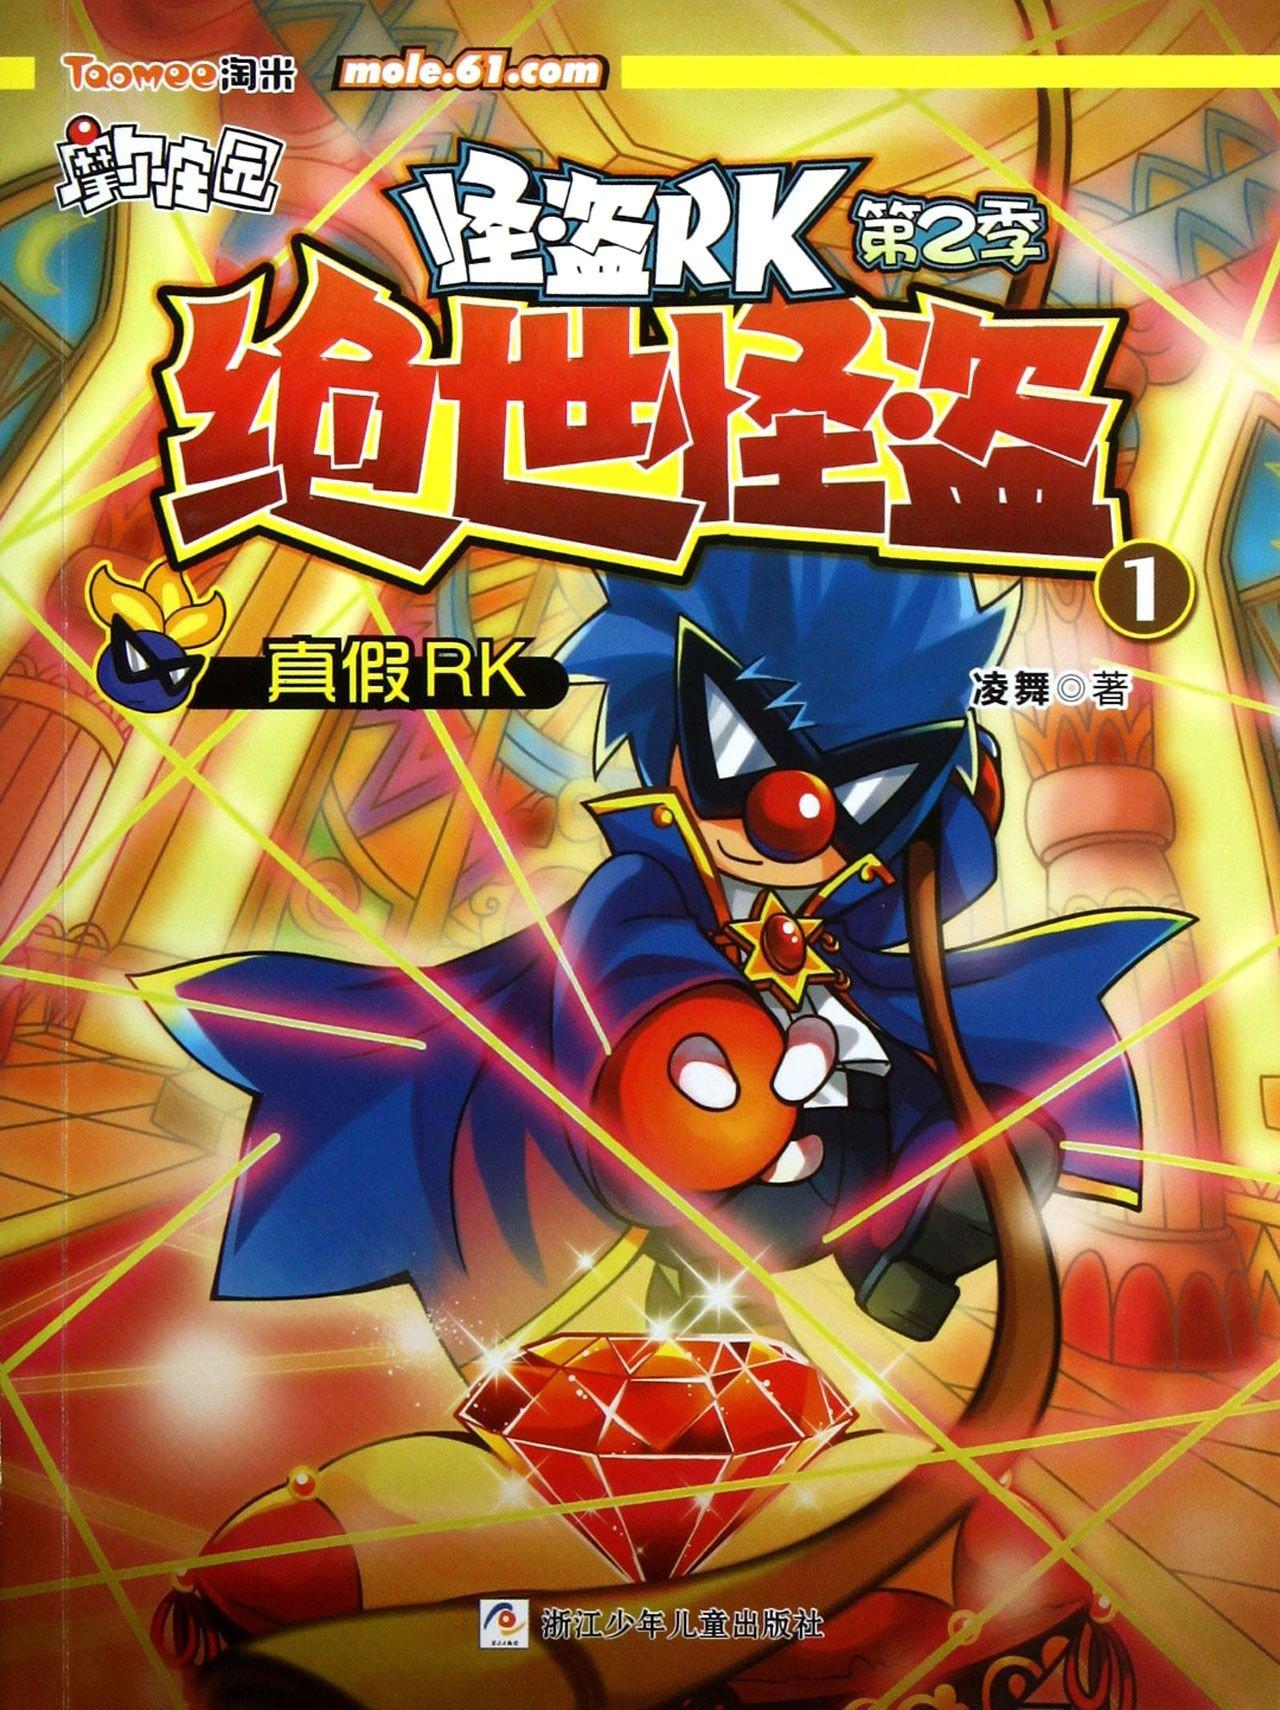 Download RK- genuine masterpiece Kaito - Kaito PK- Season 2 -1 - book comes with stickers RK mysterious magic password trailer pdf